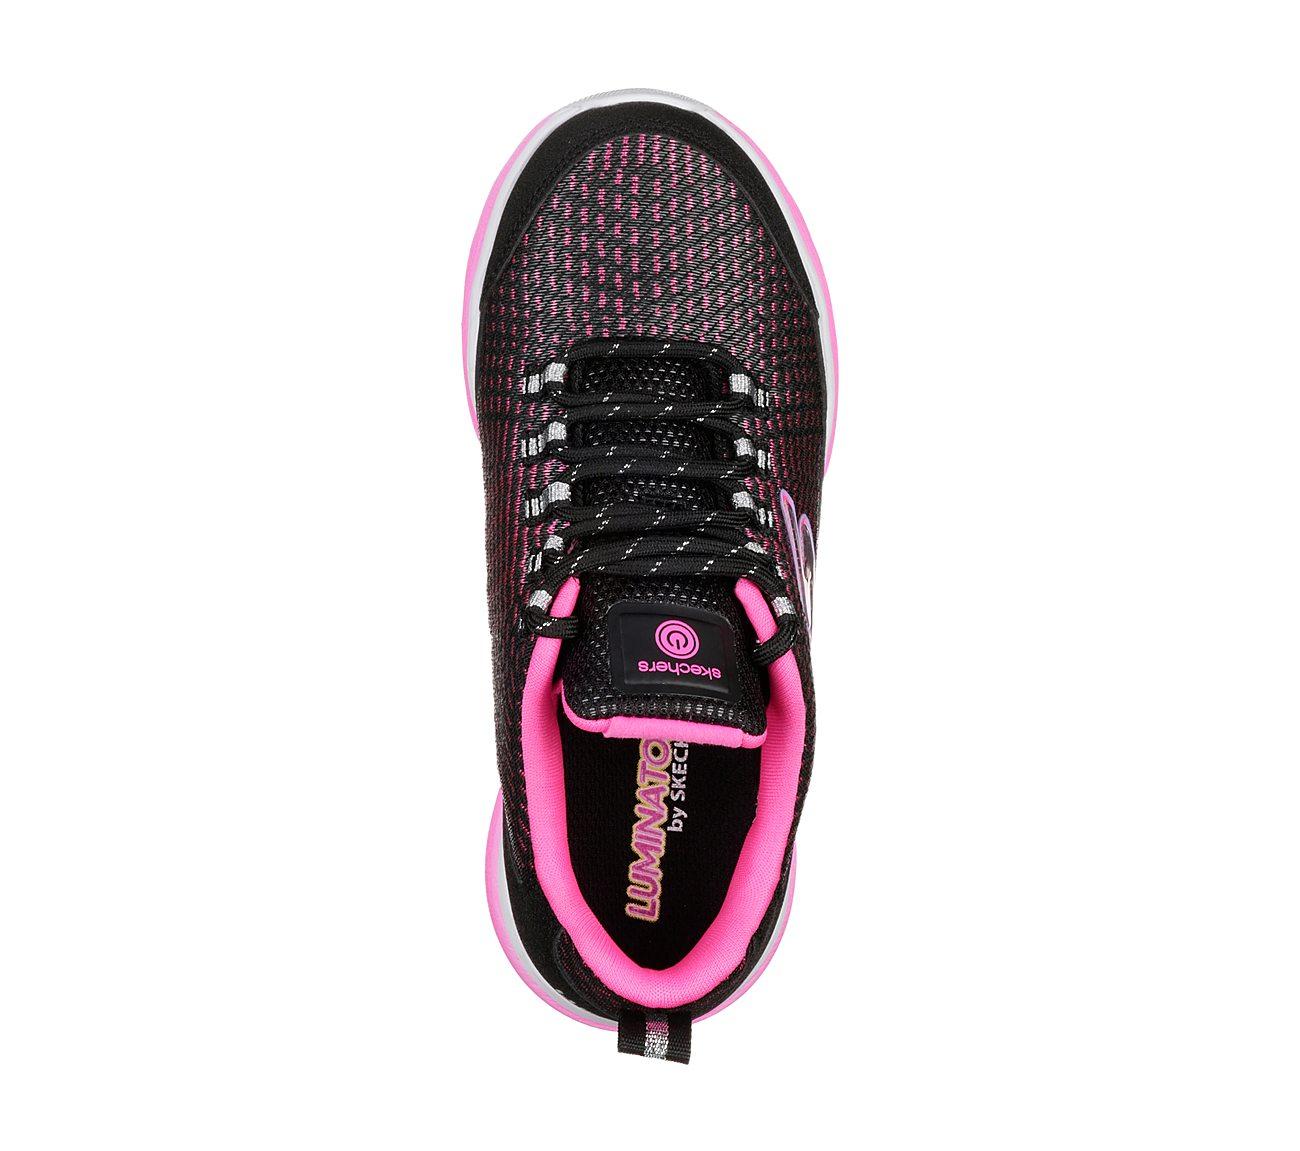 94f4b8c1bc18 Buy SKECHERS S Lights  Luminators S-Lights Shoes only  105.00